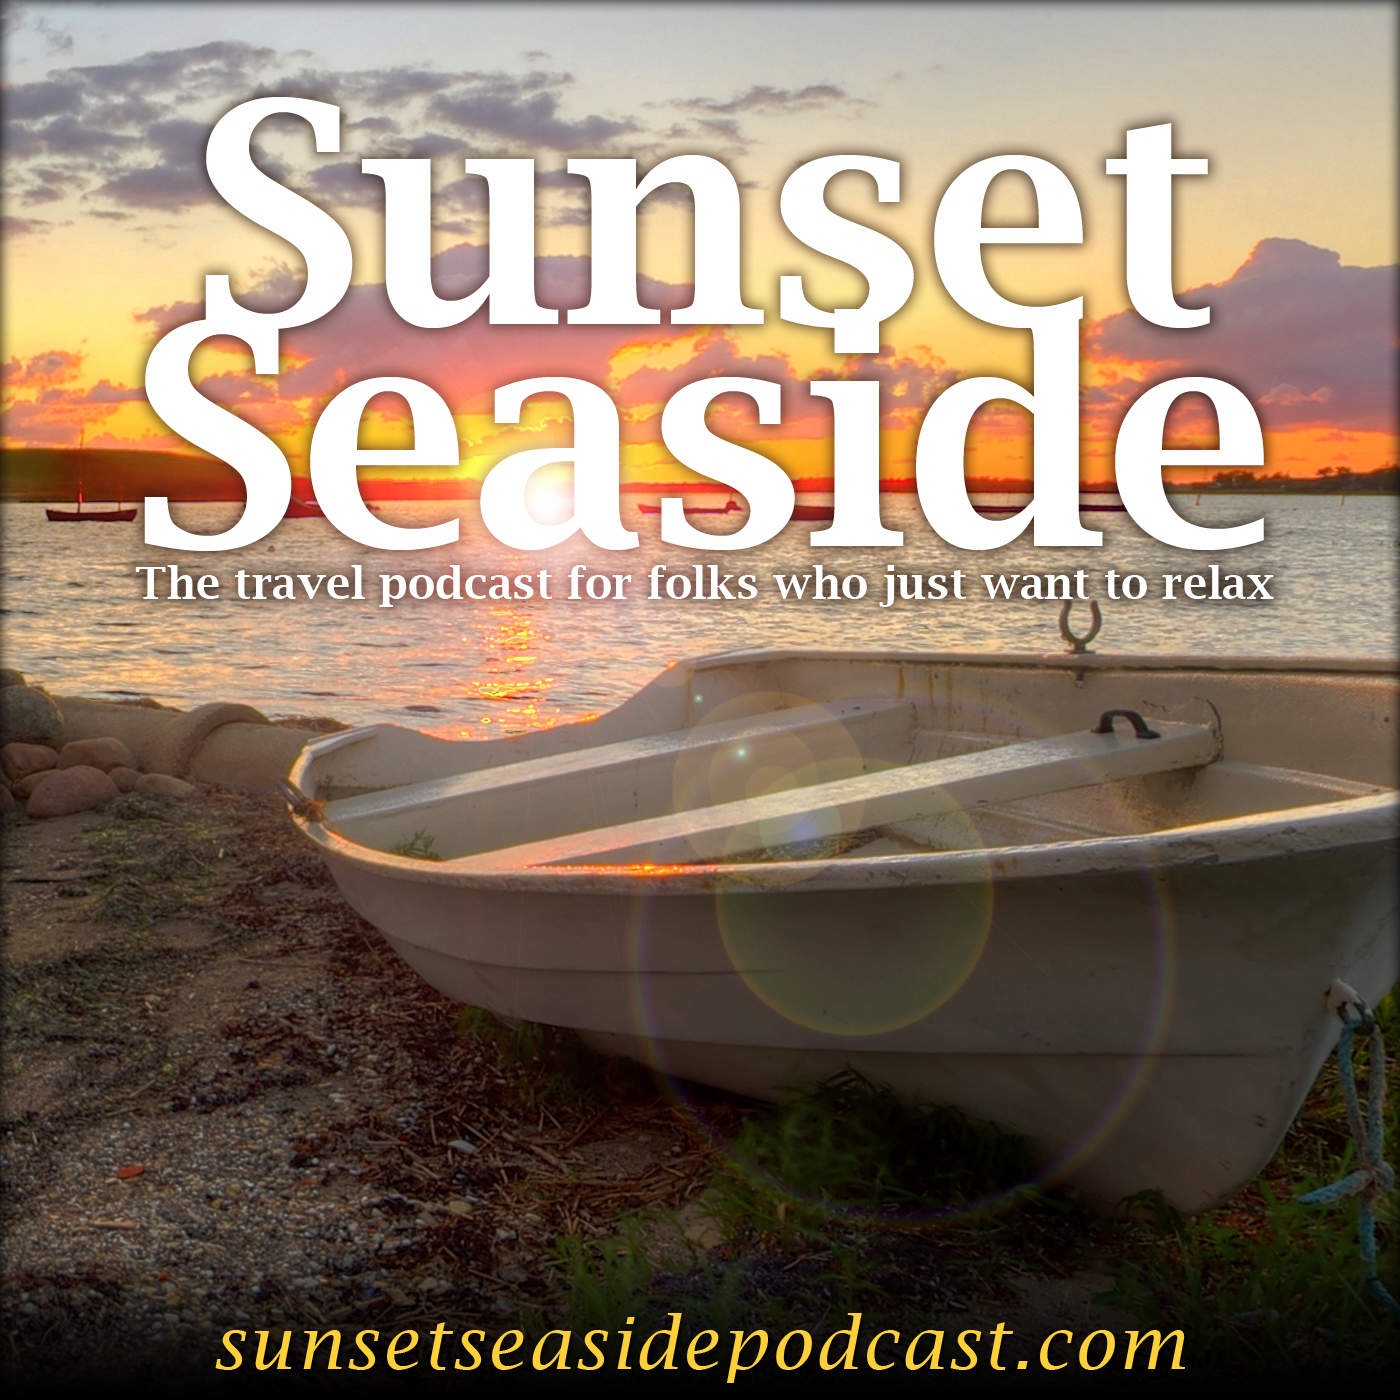 SunsetSeaside